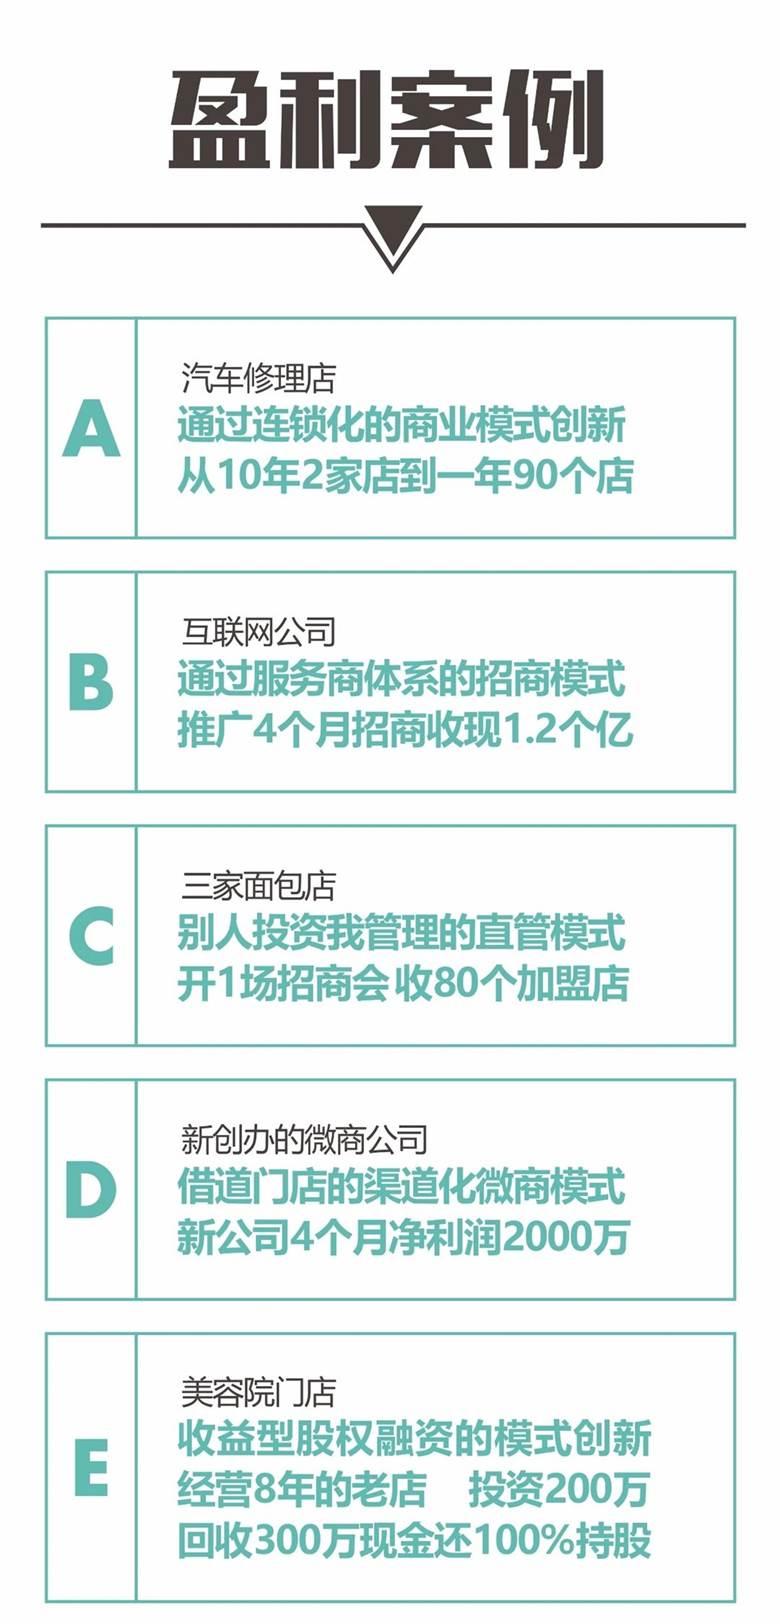 http://www.huodongxing.com/file/20191113/1063603644976/893659464677108.jpg